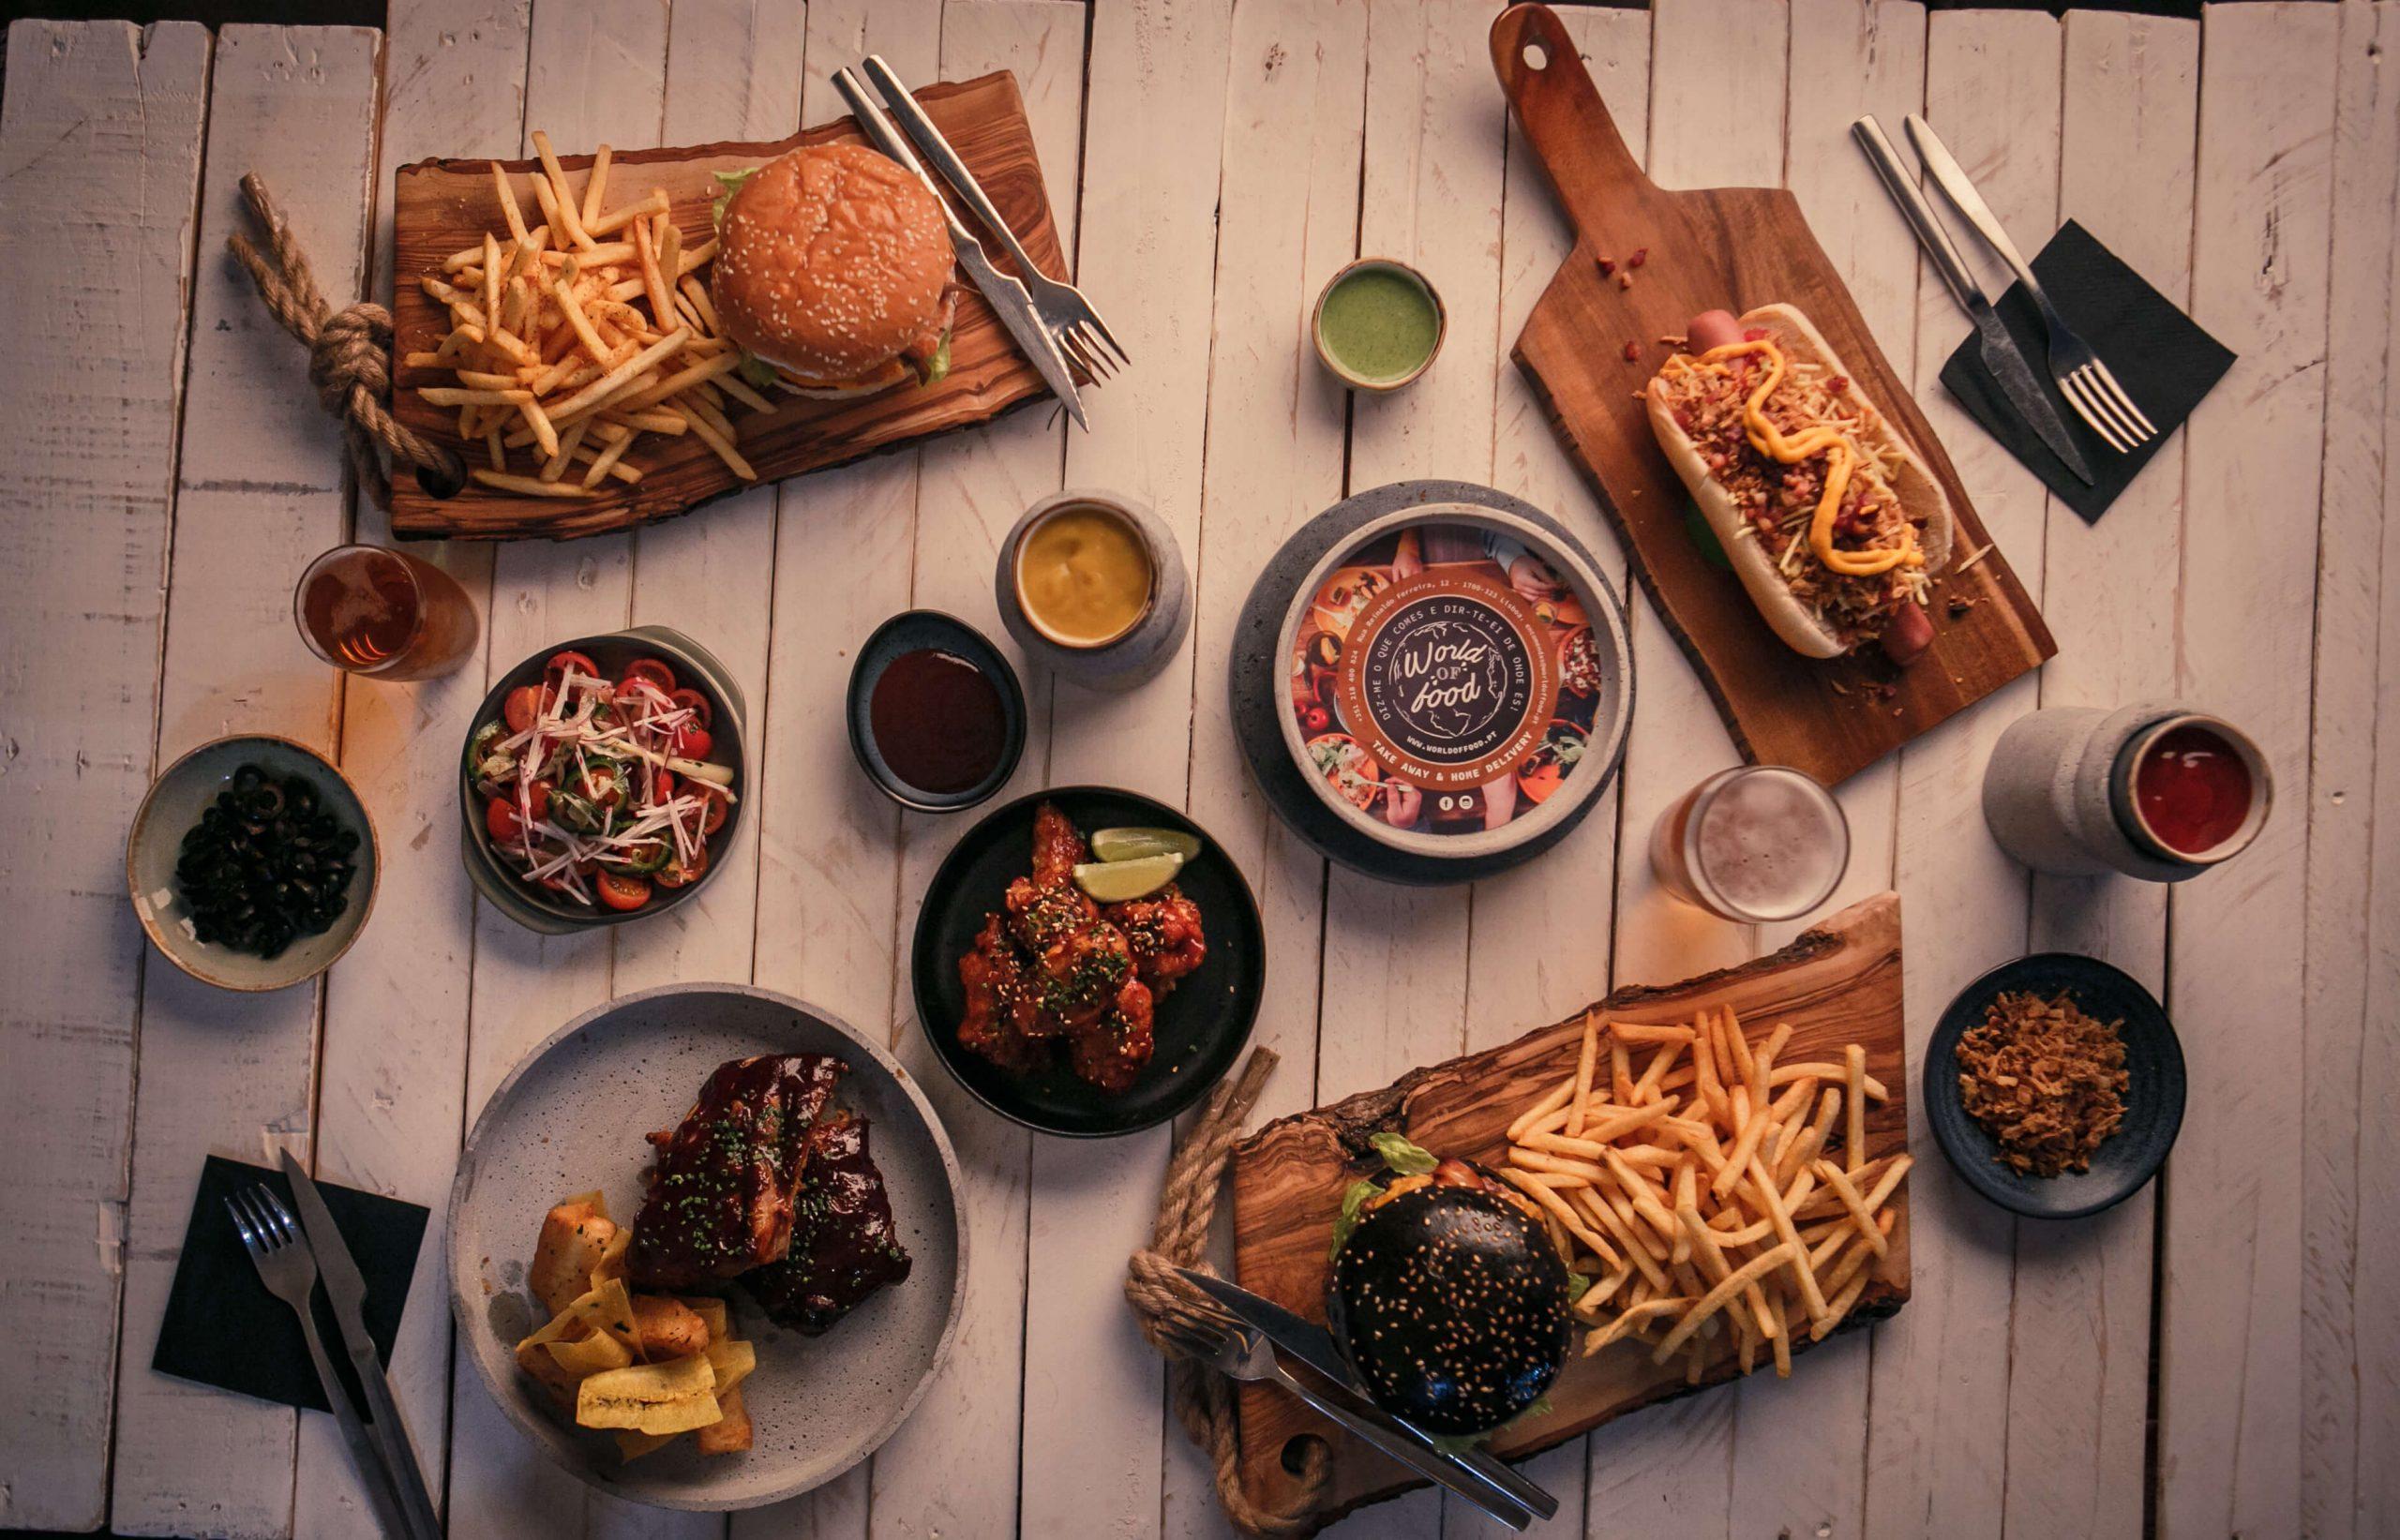 World of food - MAD-123